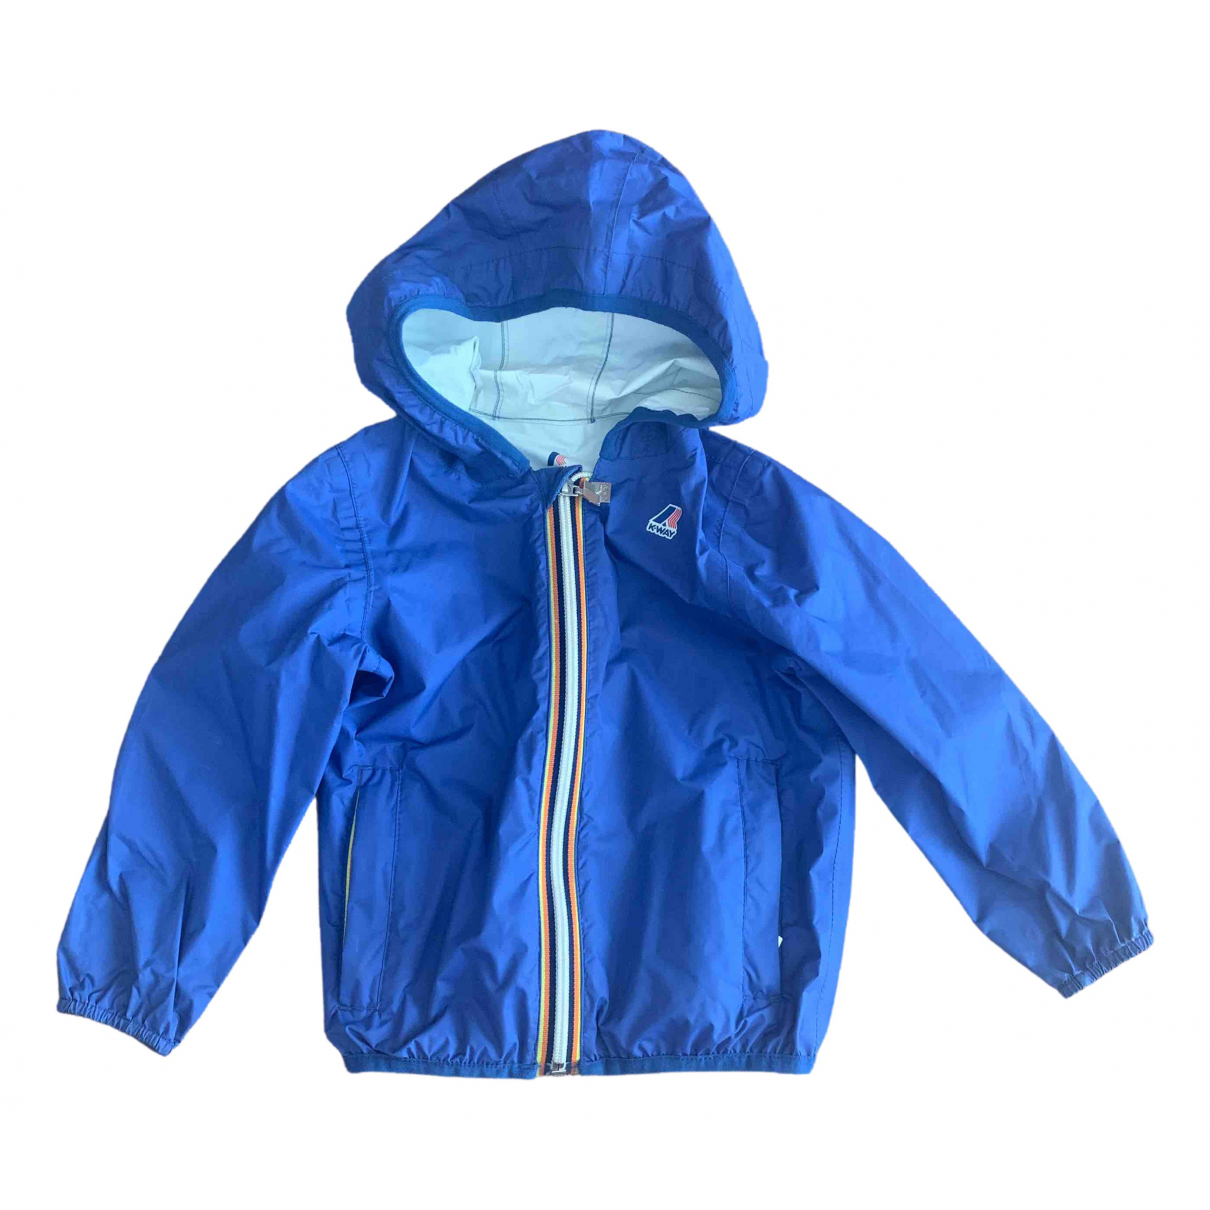 K-way \N Jacke, Maentel in  Blau Polyester